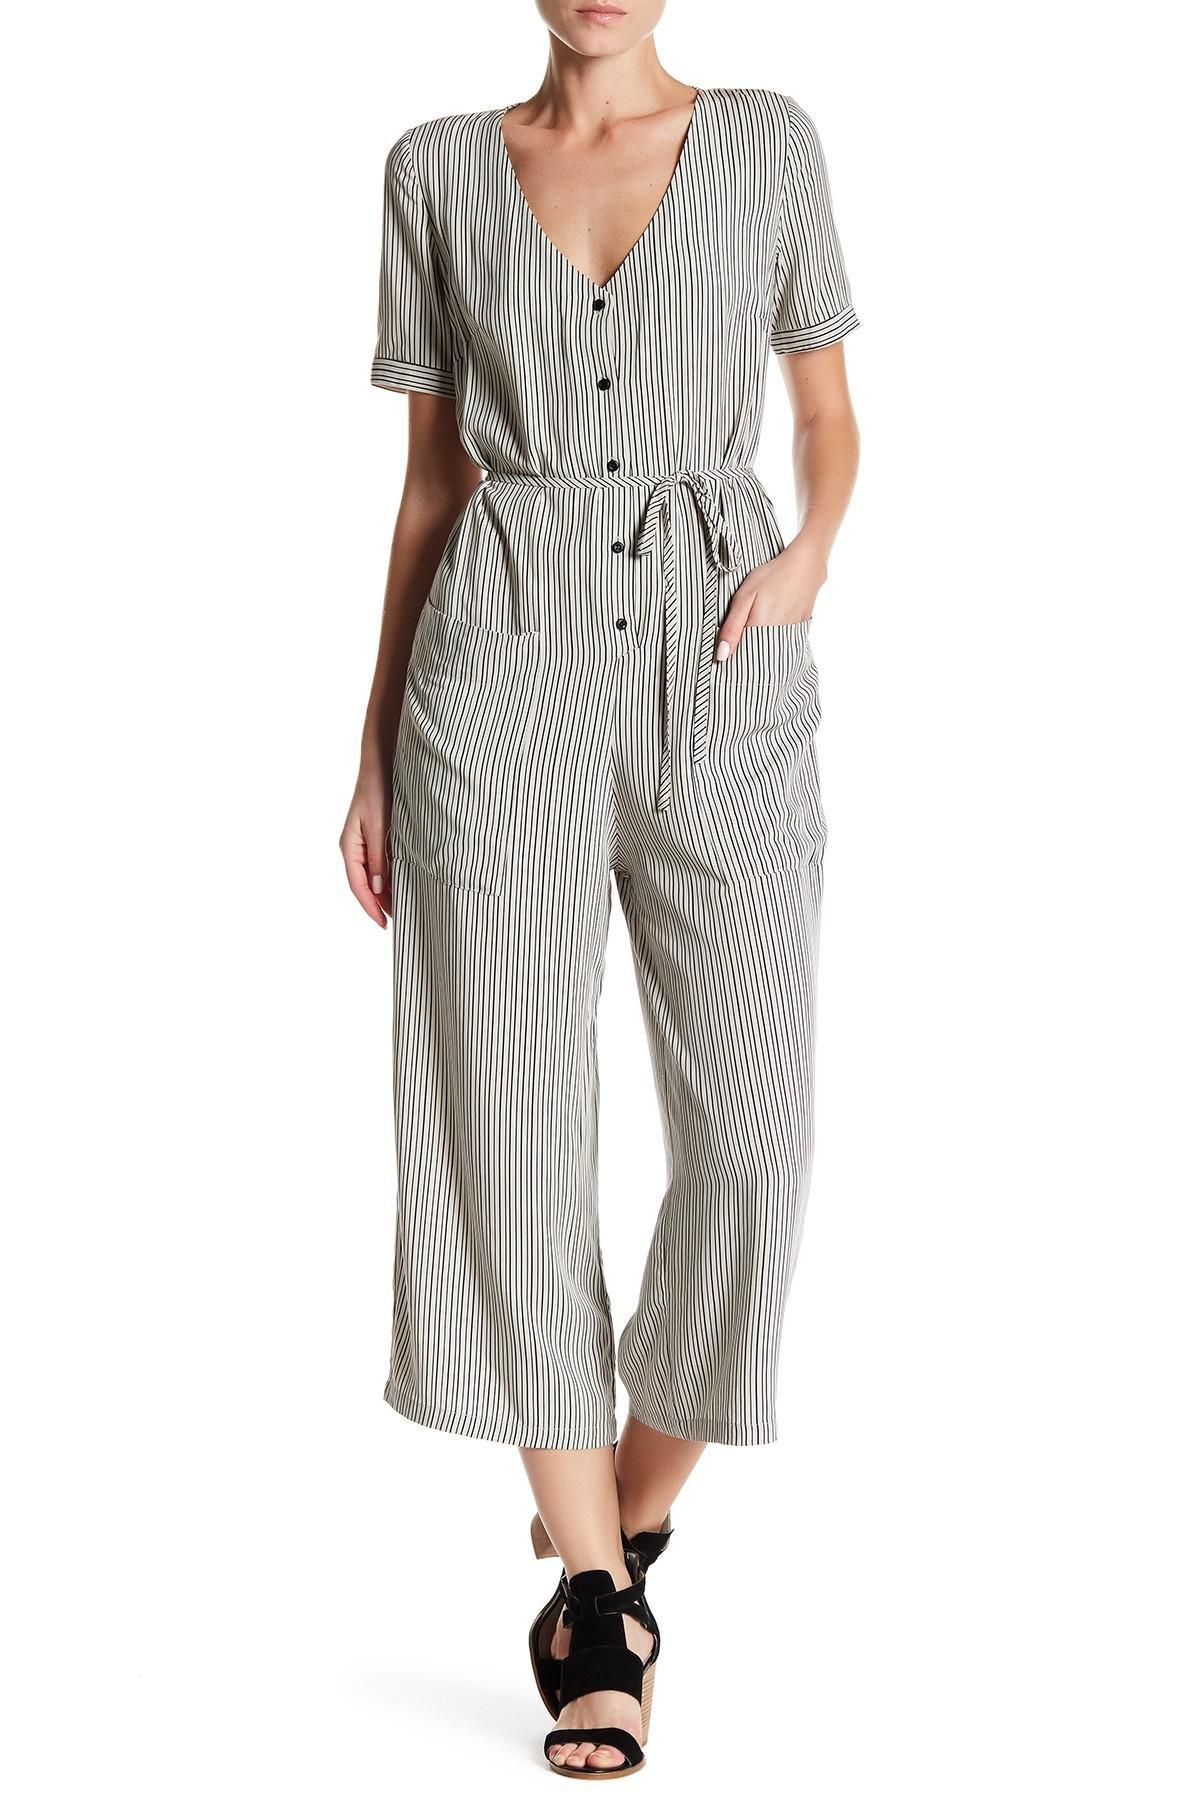 58a9f5180019 Lyst - Dress Forum Crop Leg Jumpsuit